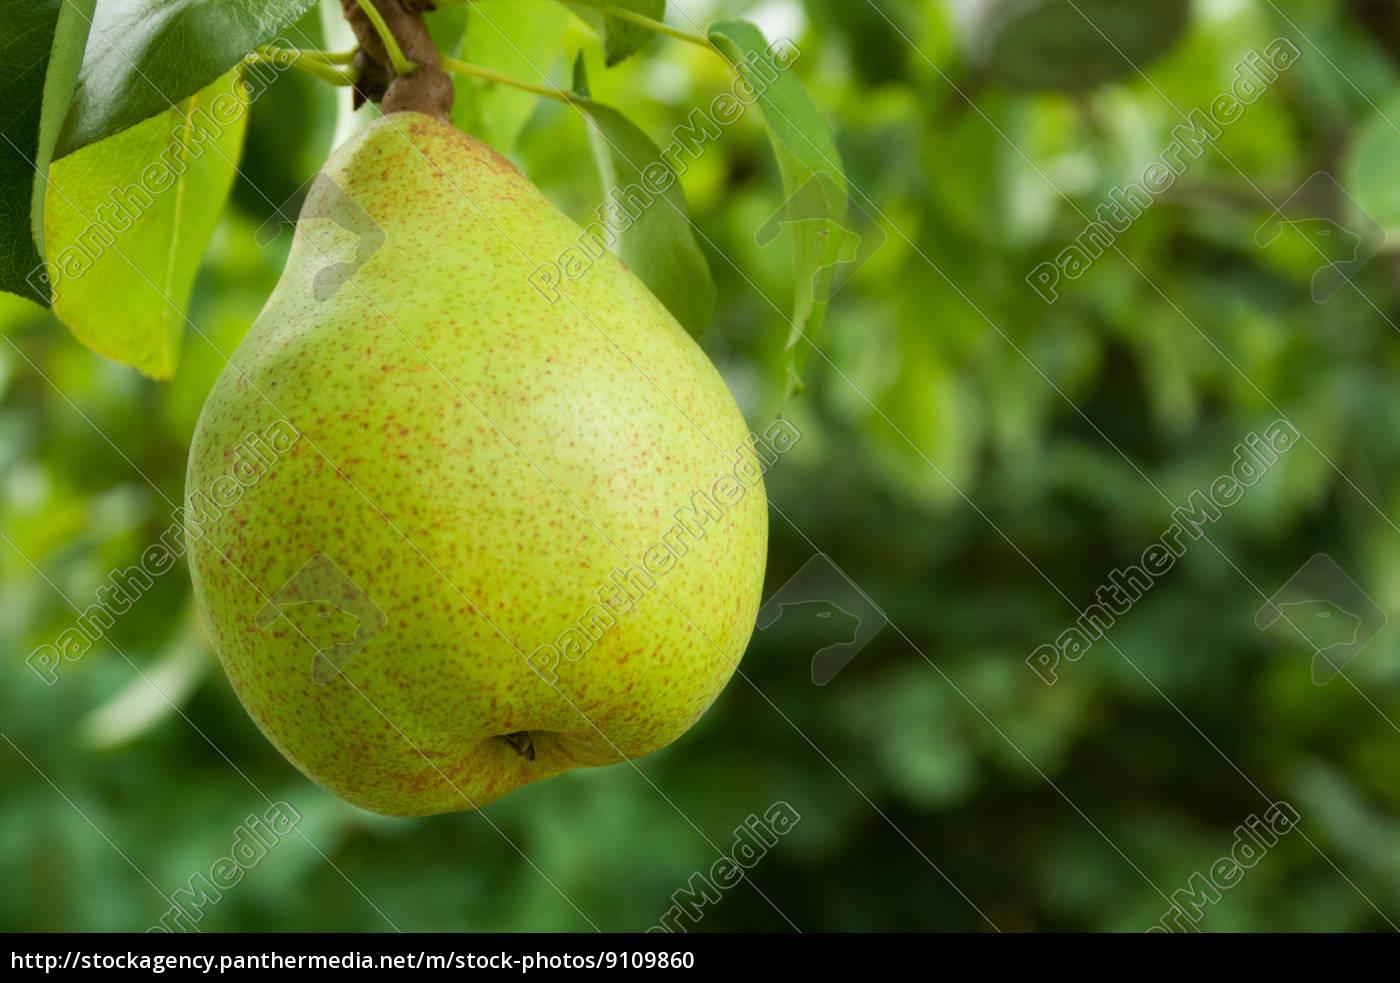 blatt, baumblatt, baum, baeume, gruen, gruenes - 9109860